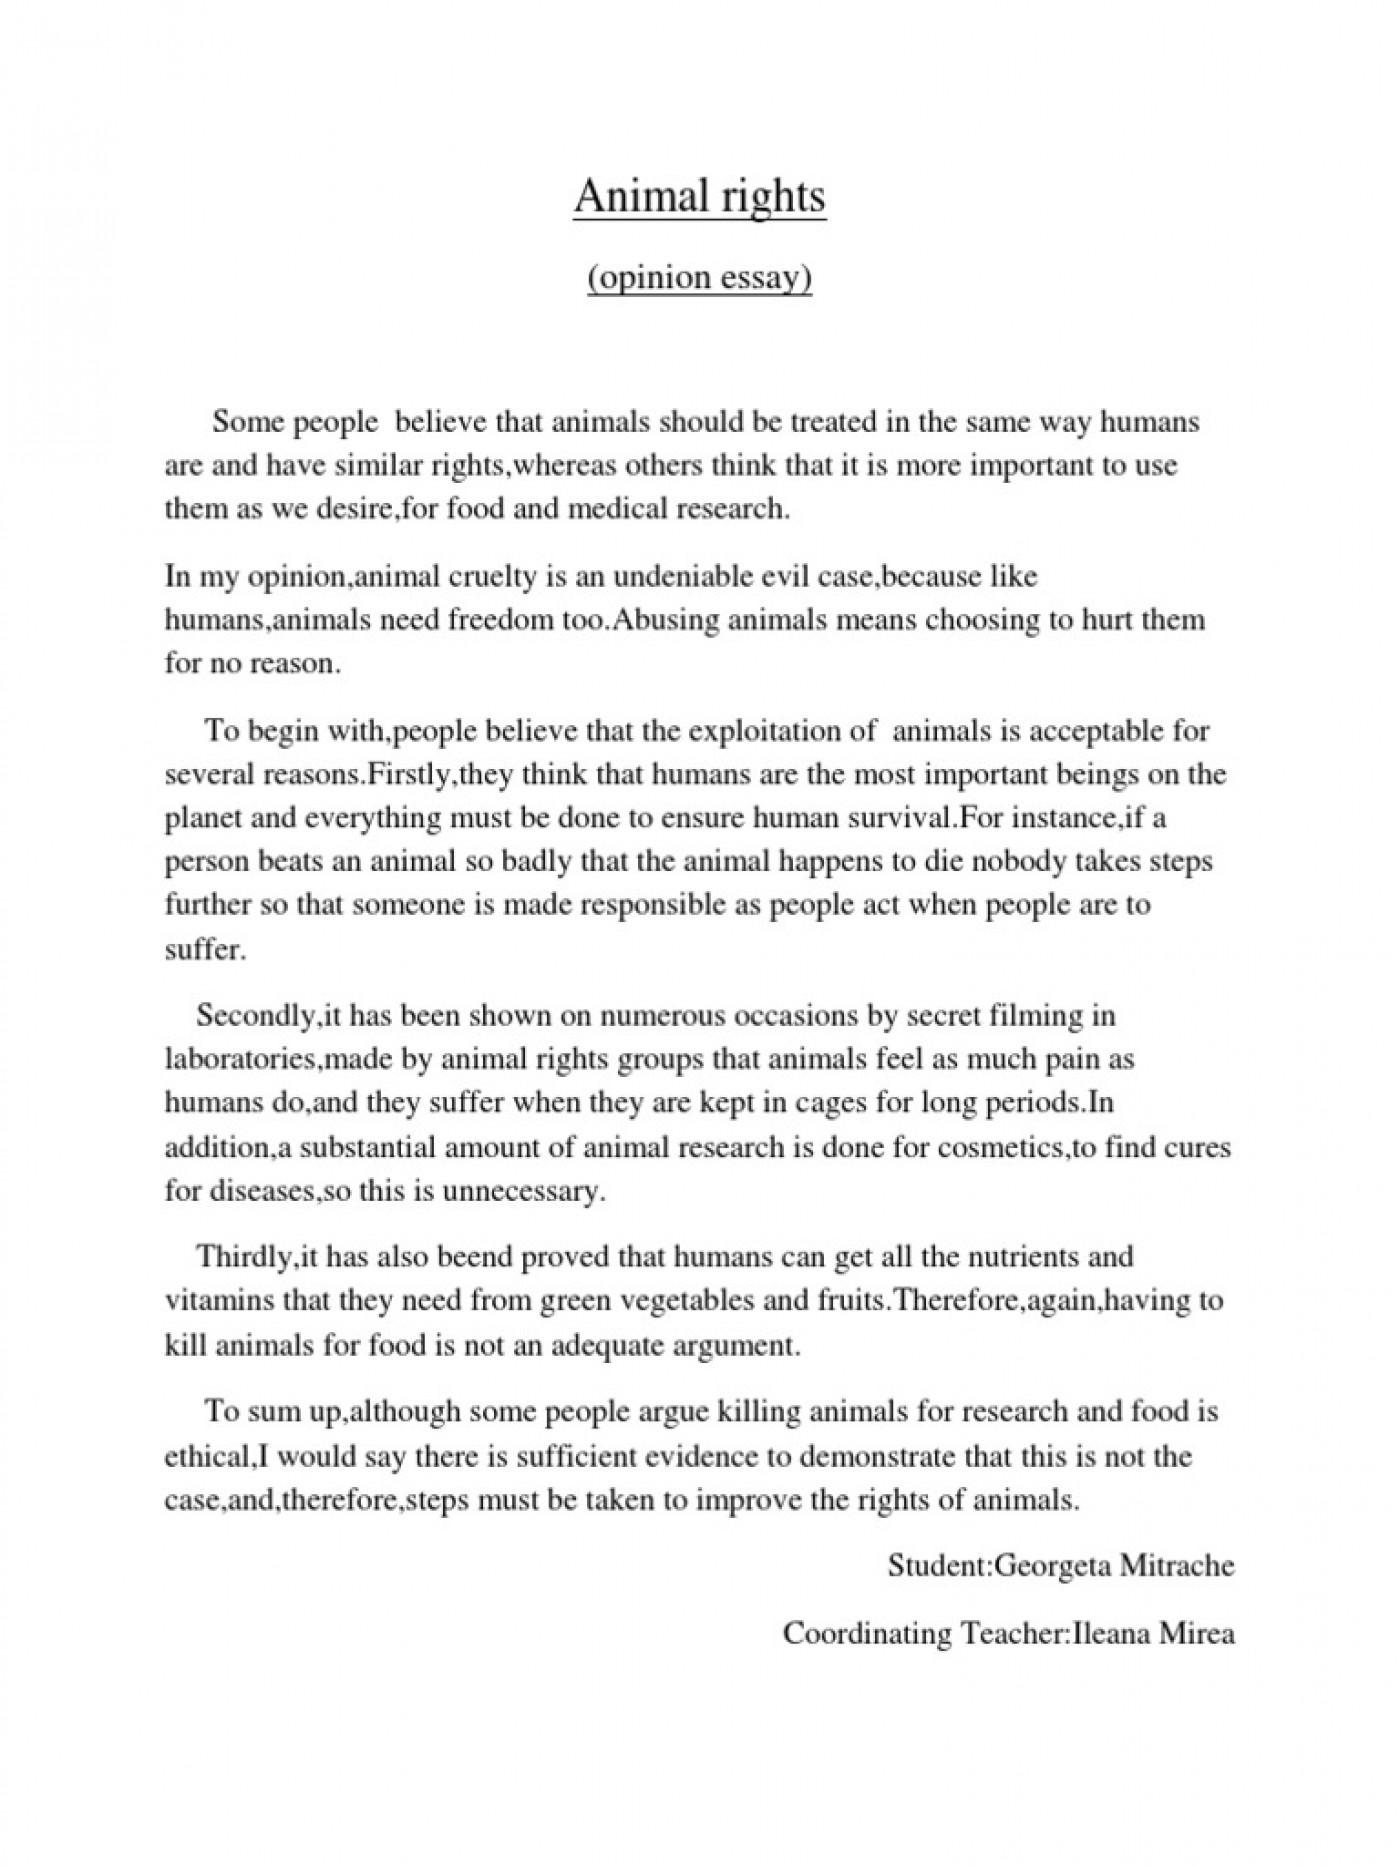 argumentative essay animal rights